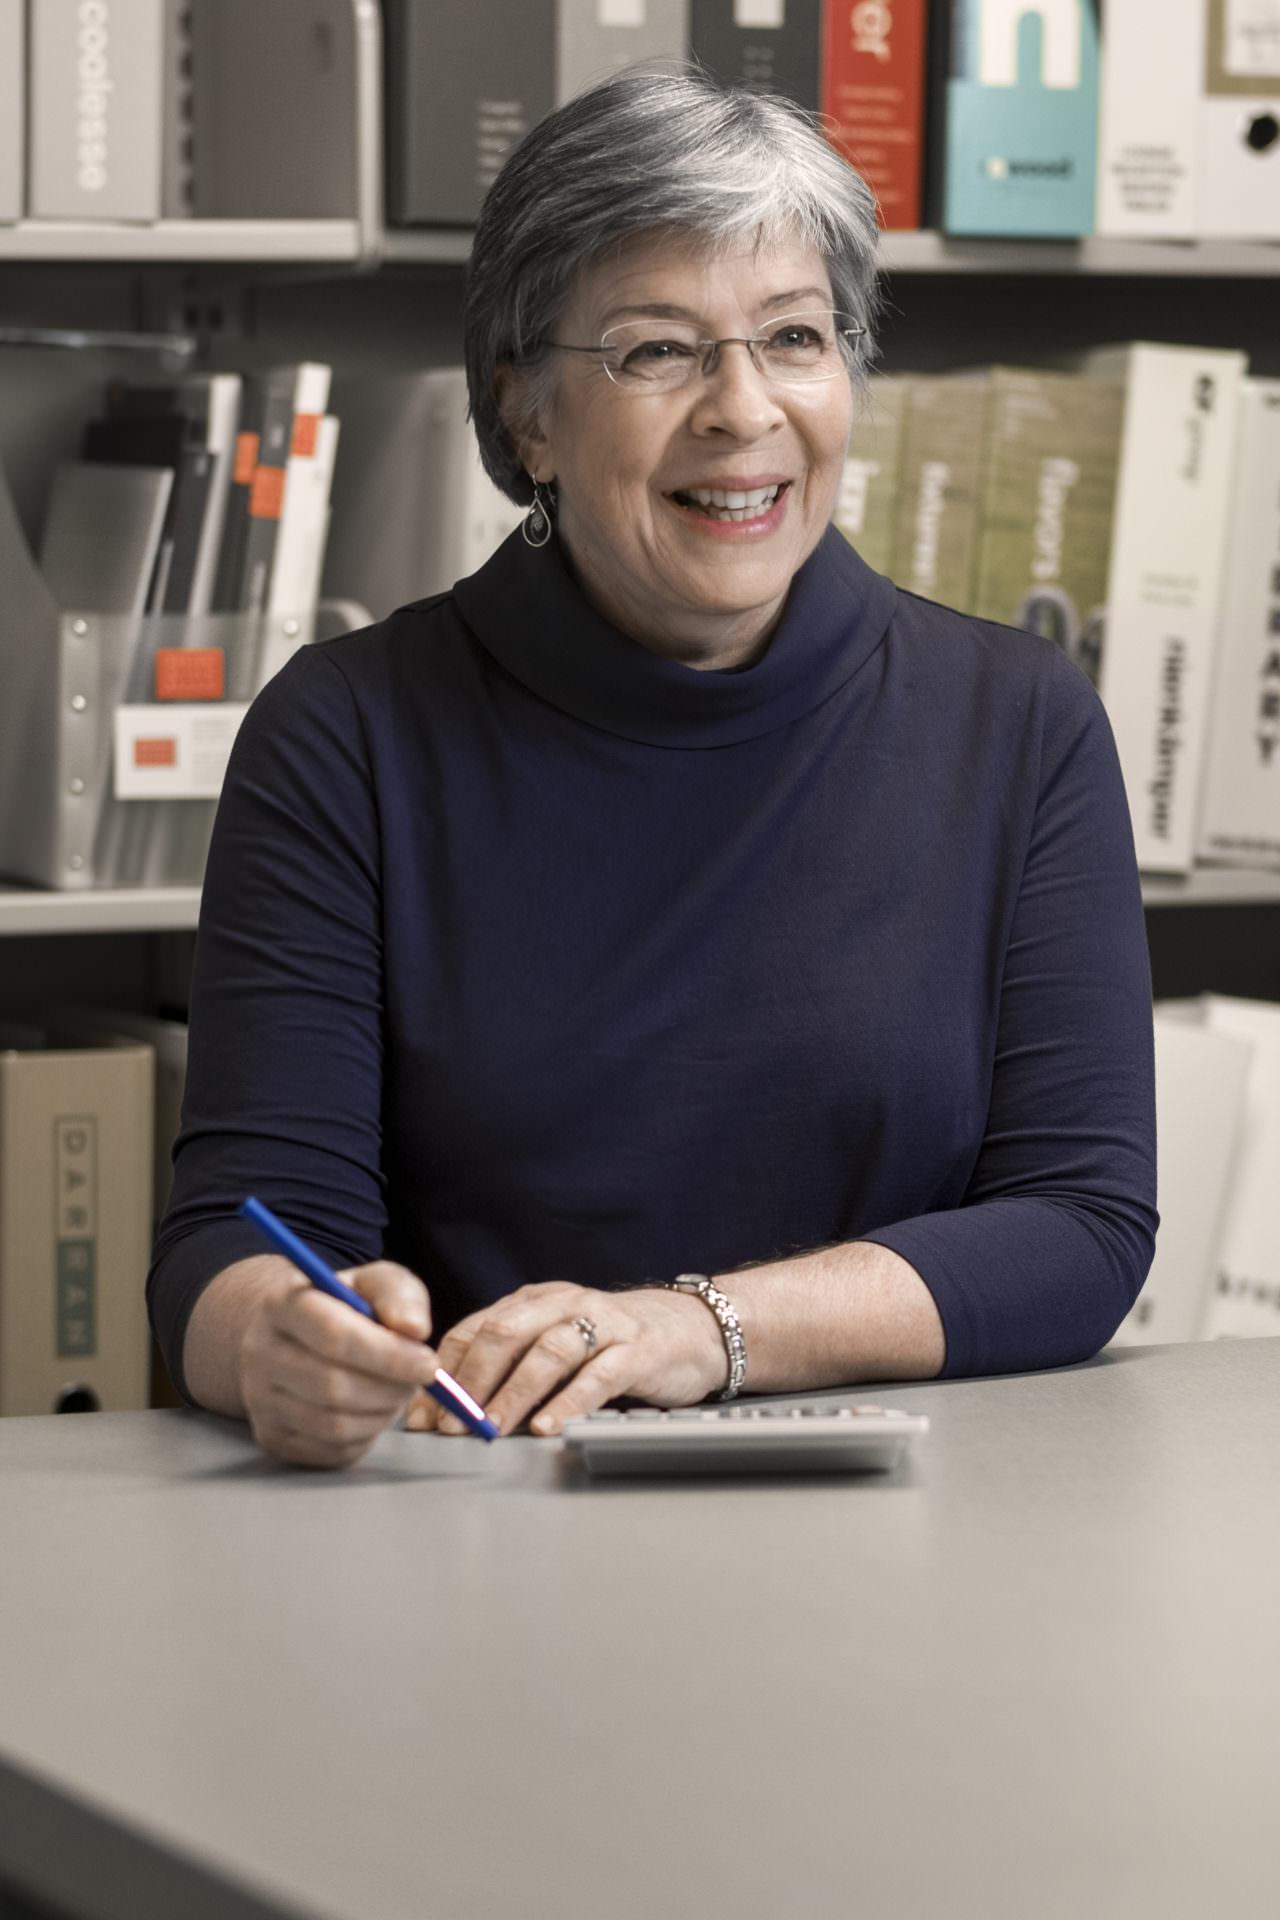 Susan Zeigler